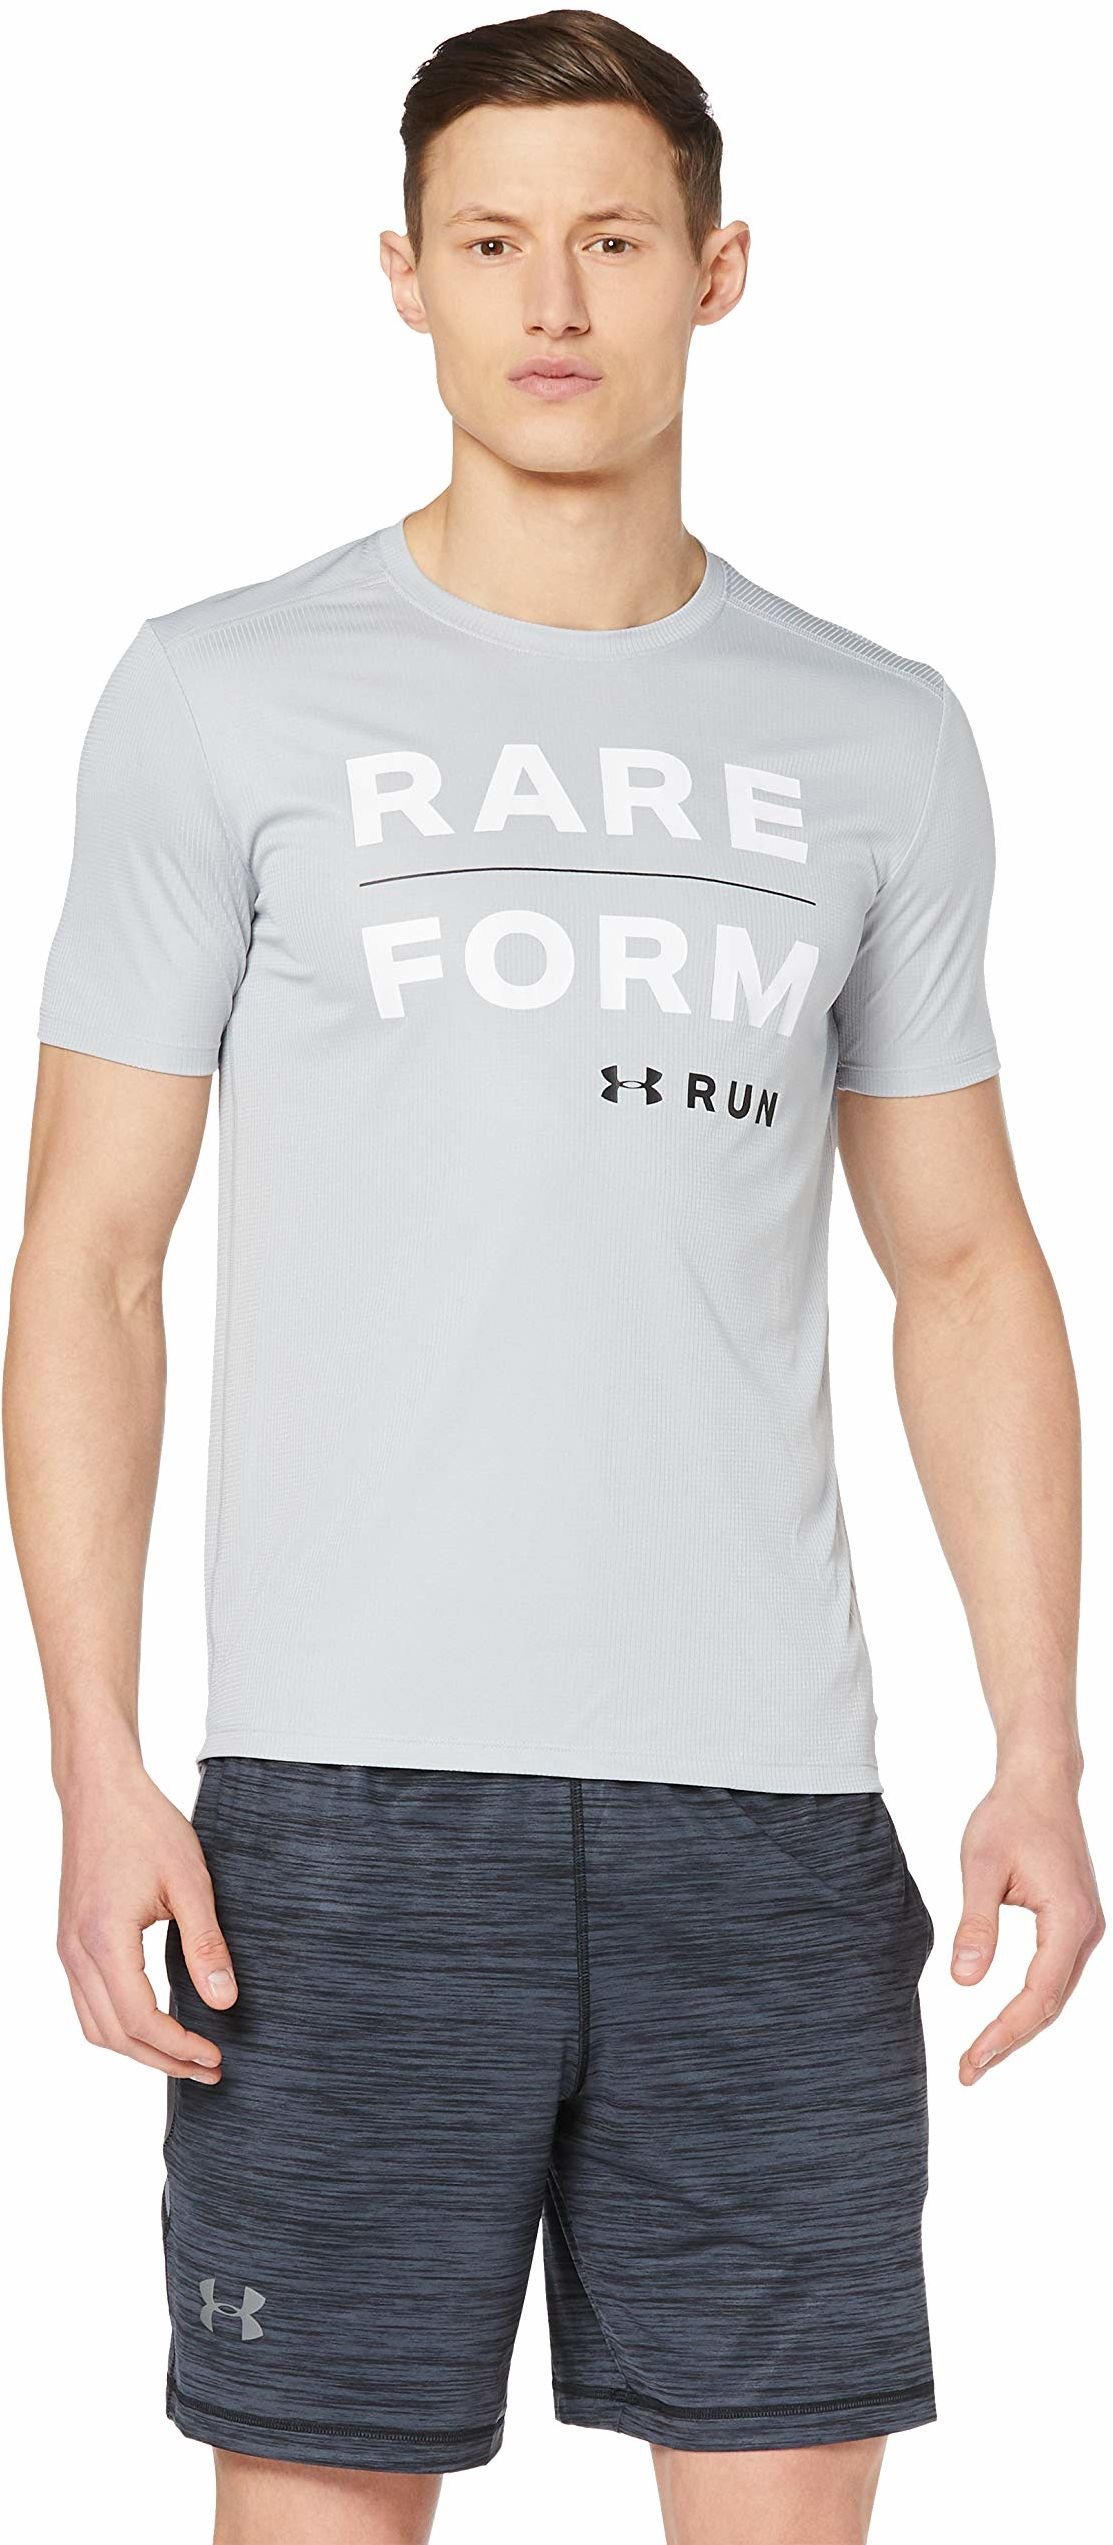 Under Armour koszulka męska Run Form Graphic Tee Tank Mod Grey/White/Pitch Grey M